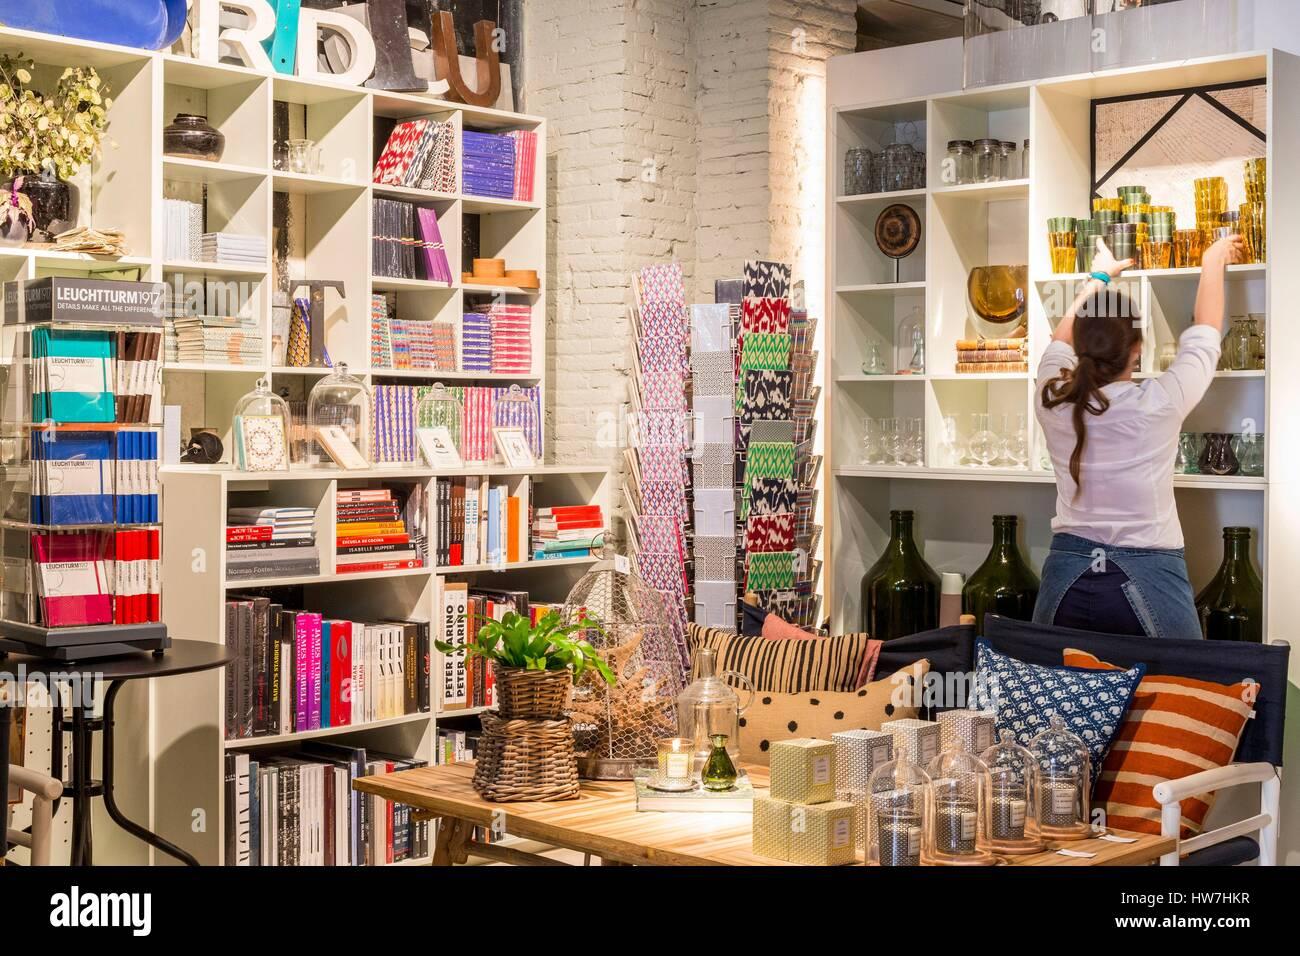 España, Cataluña, Barcelona, Eixample, Jaime Beriestain concept store abrió sus puertas en 2010 Imagen De Stock